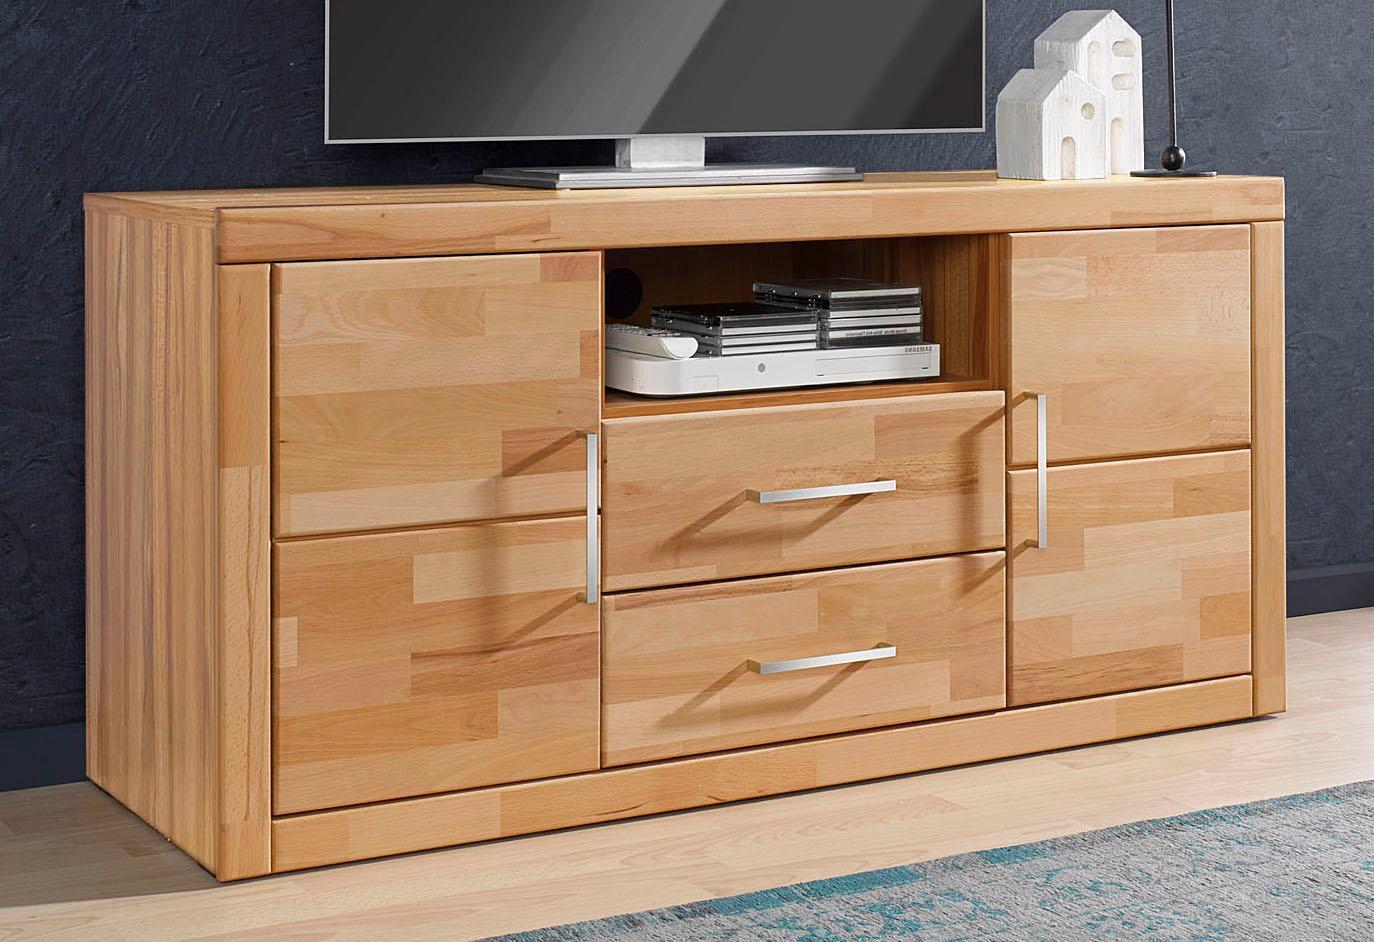 Places of Style Lowboard, Breite 130 cm kaufen | BAUR